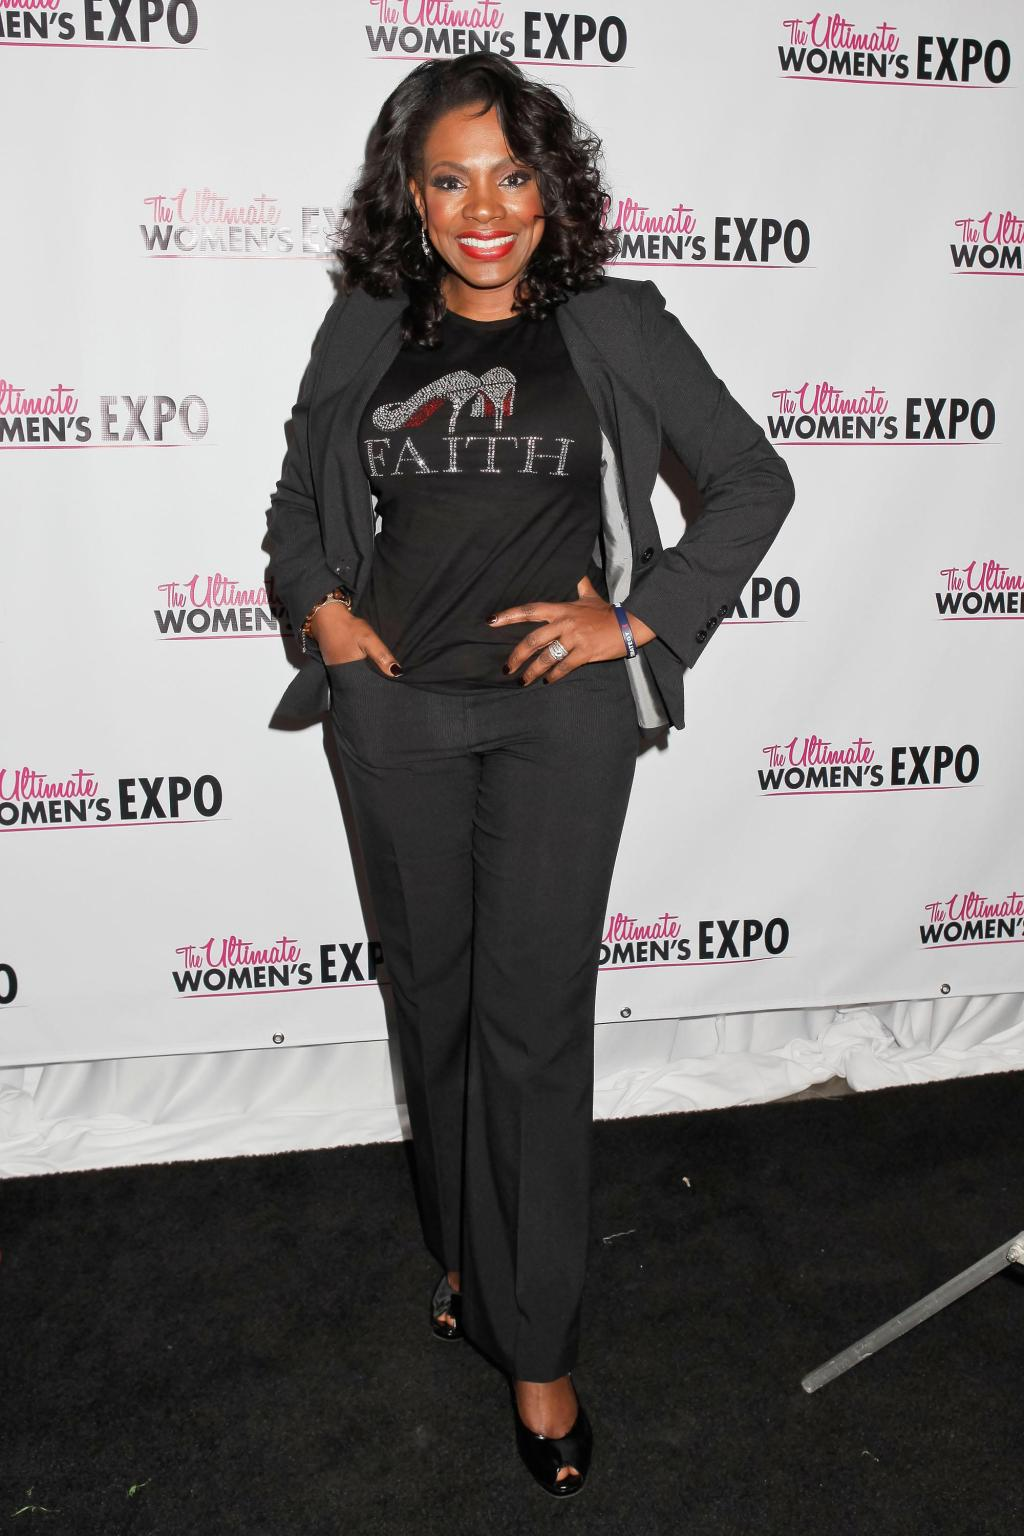 Los Angeles Women's Expo - Day 2